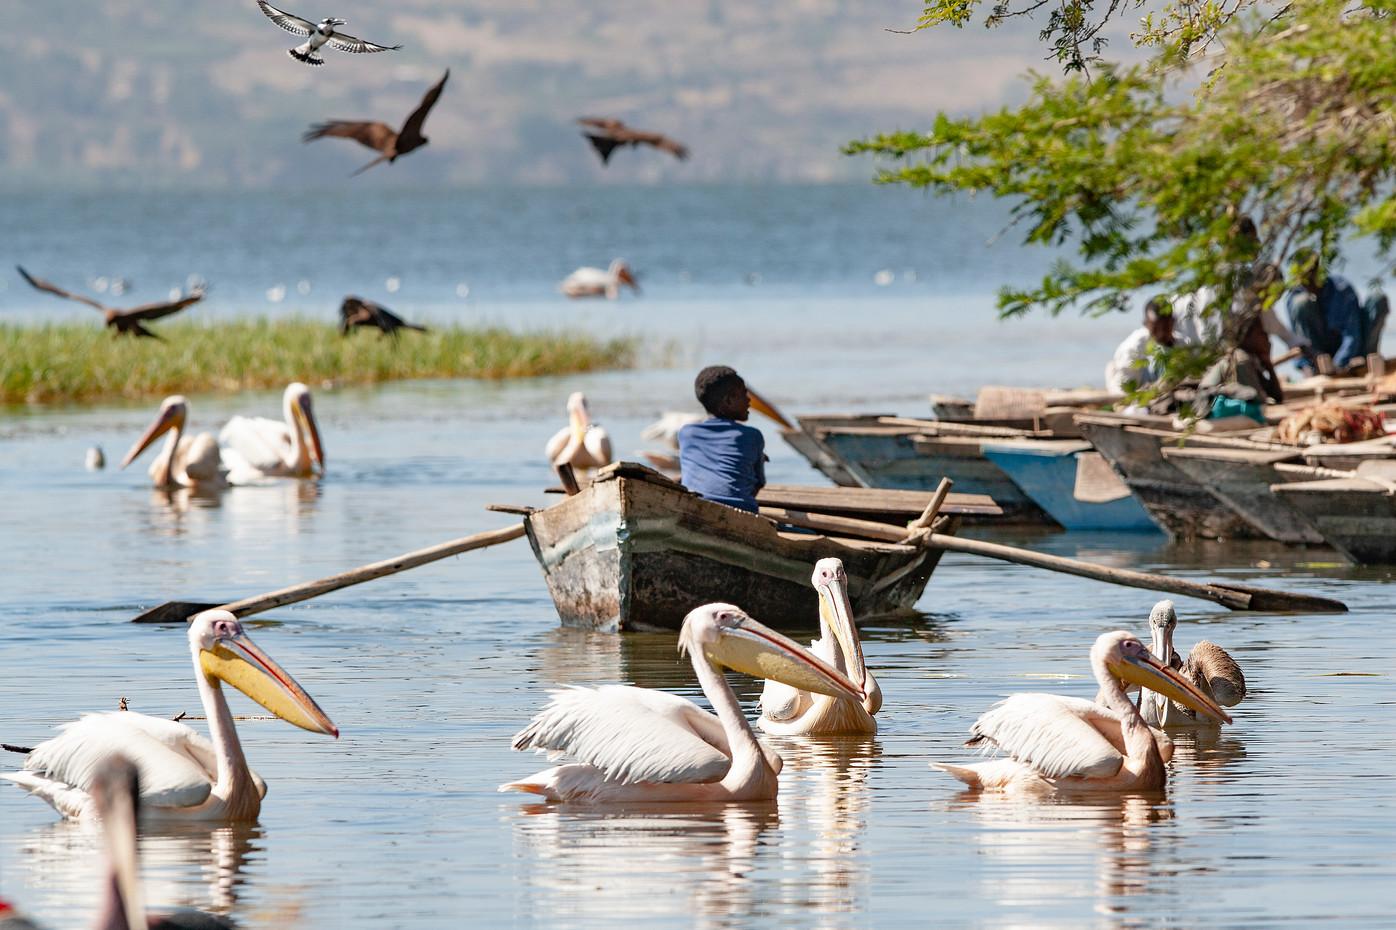 Fish market at Lake Awassa, Ethiopia